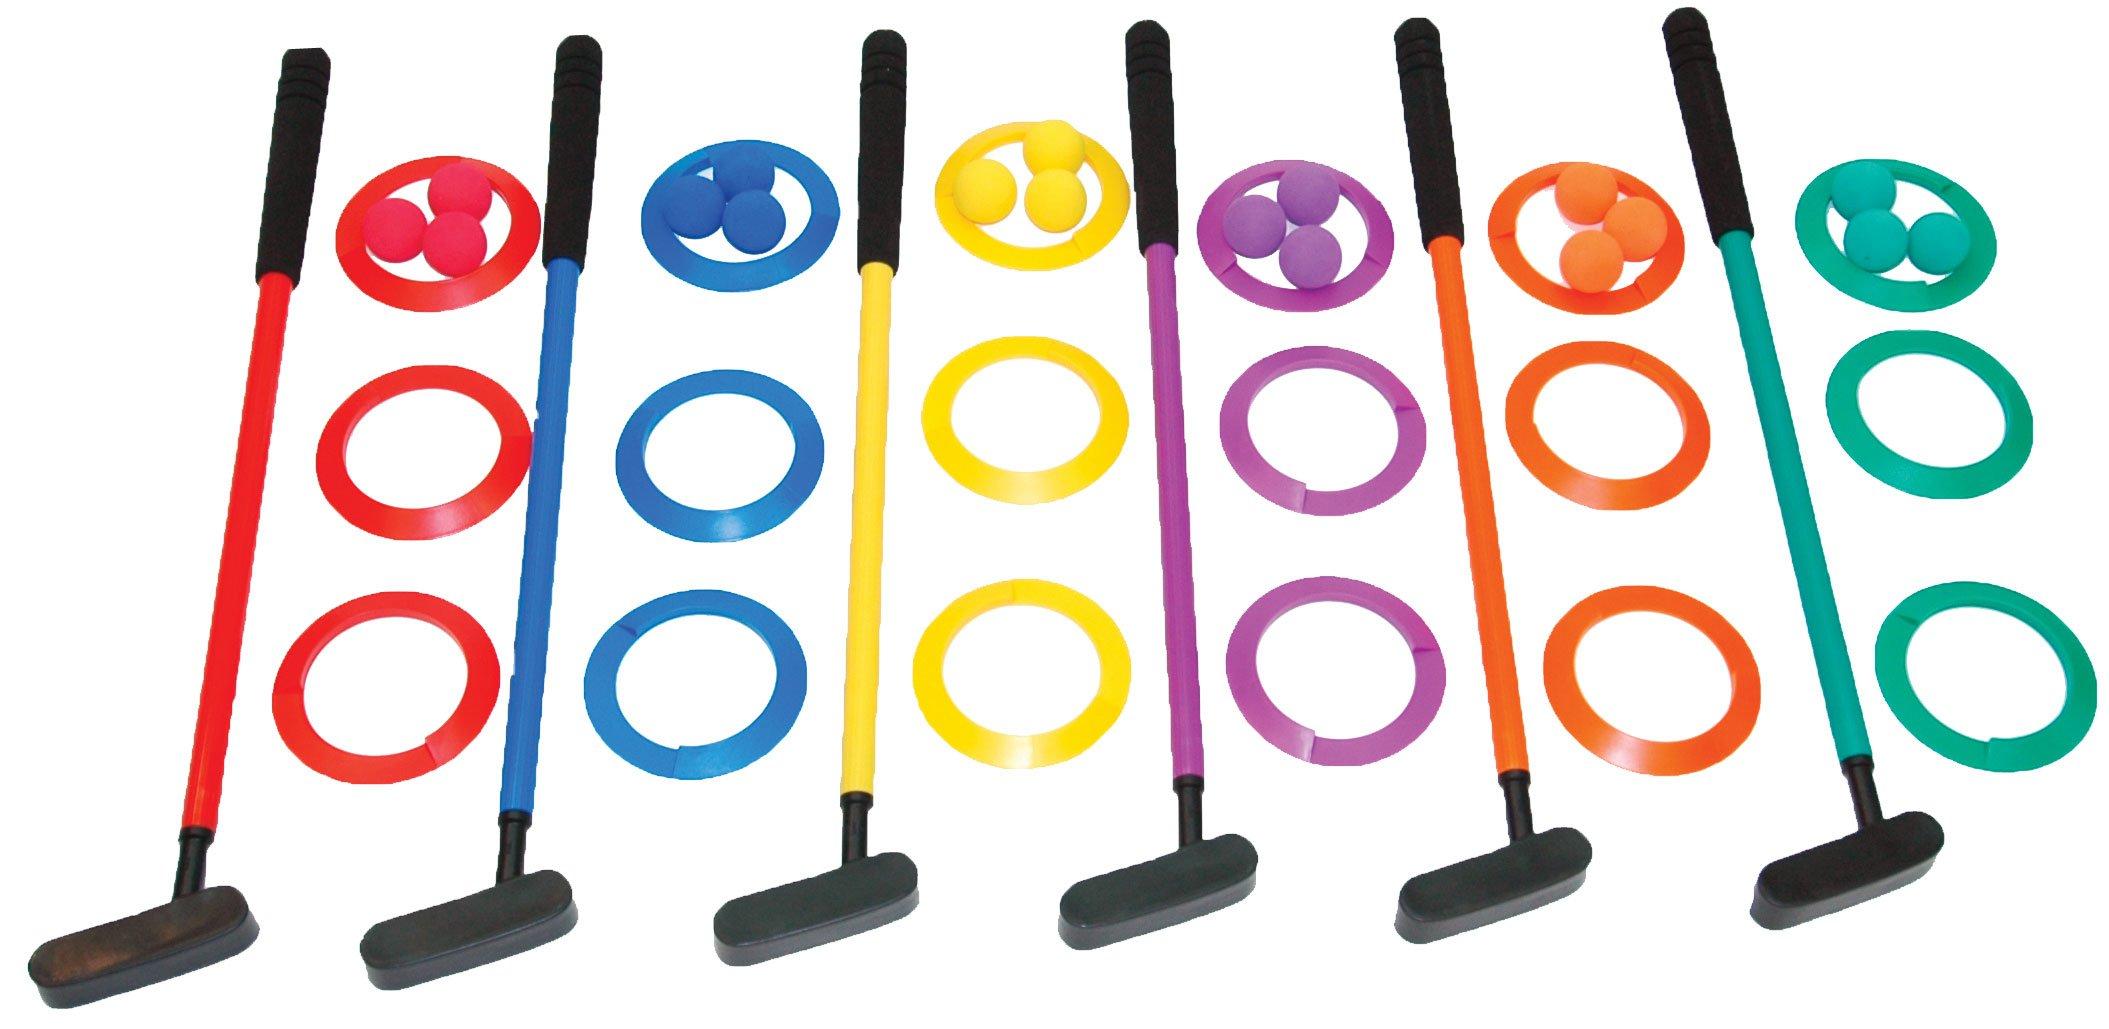 Champion Sports Mini Golf Clubs: Multi Colored Putt Putt Miniature Golfing Set for Kids - 6 Putters 18 Holes & 18 Balls by Champion Sports